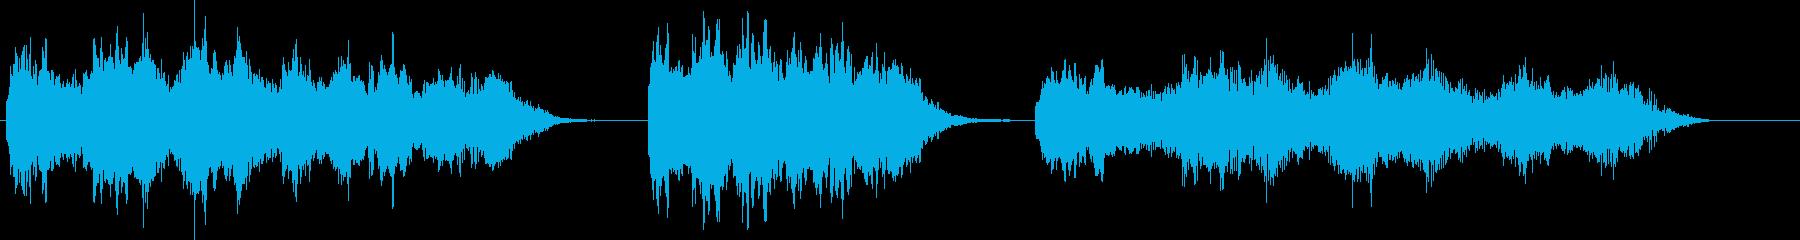 Vs-2400悪の存在、いくつかの攻撃の再生済みの波形